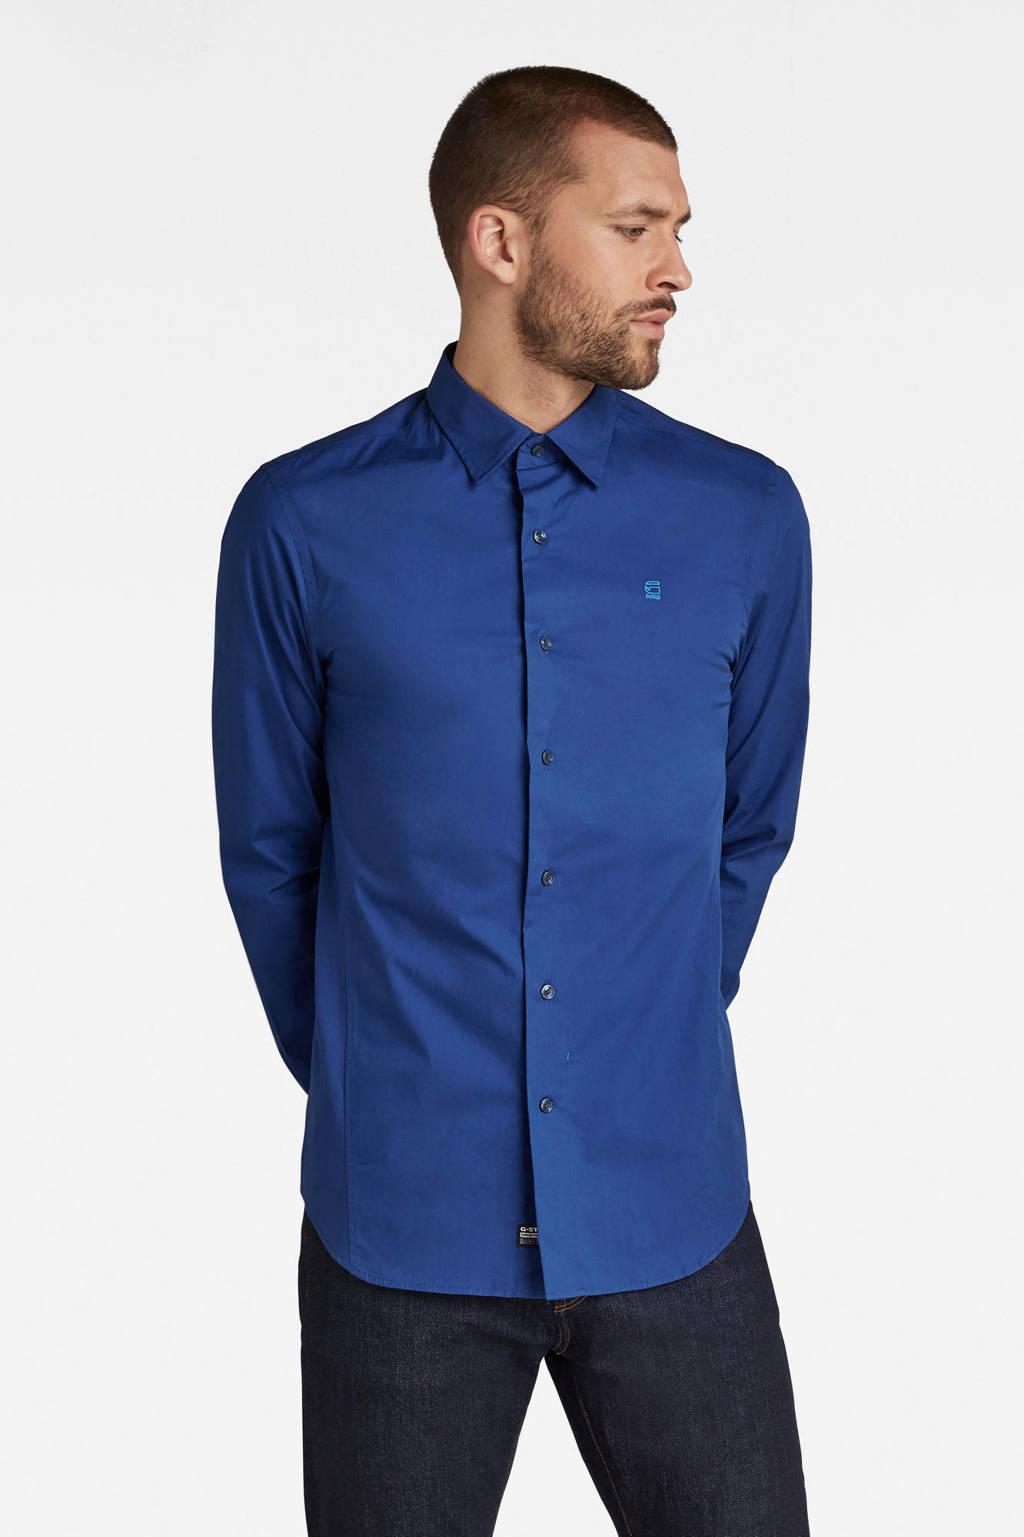 G-Star RAW super slim fit overhemd met biologisch katoen kobaltblauw, Kobaltblauw